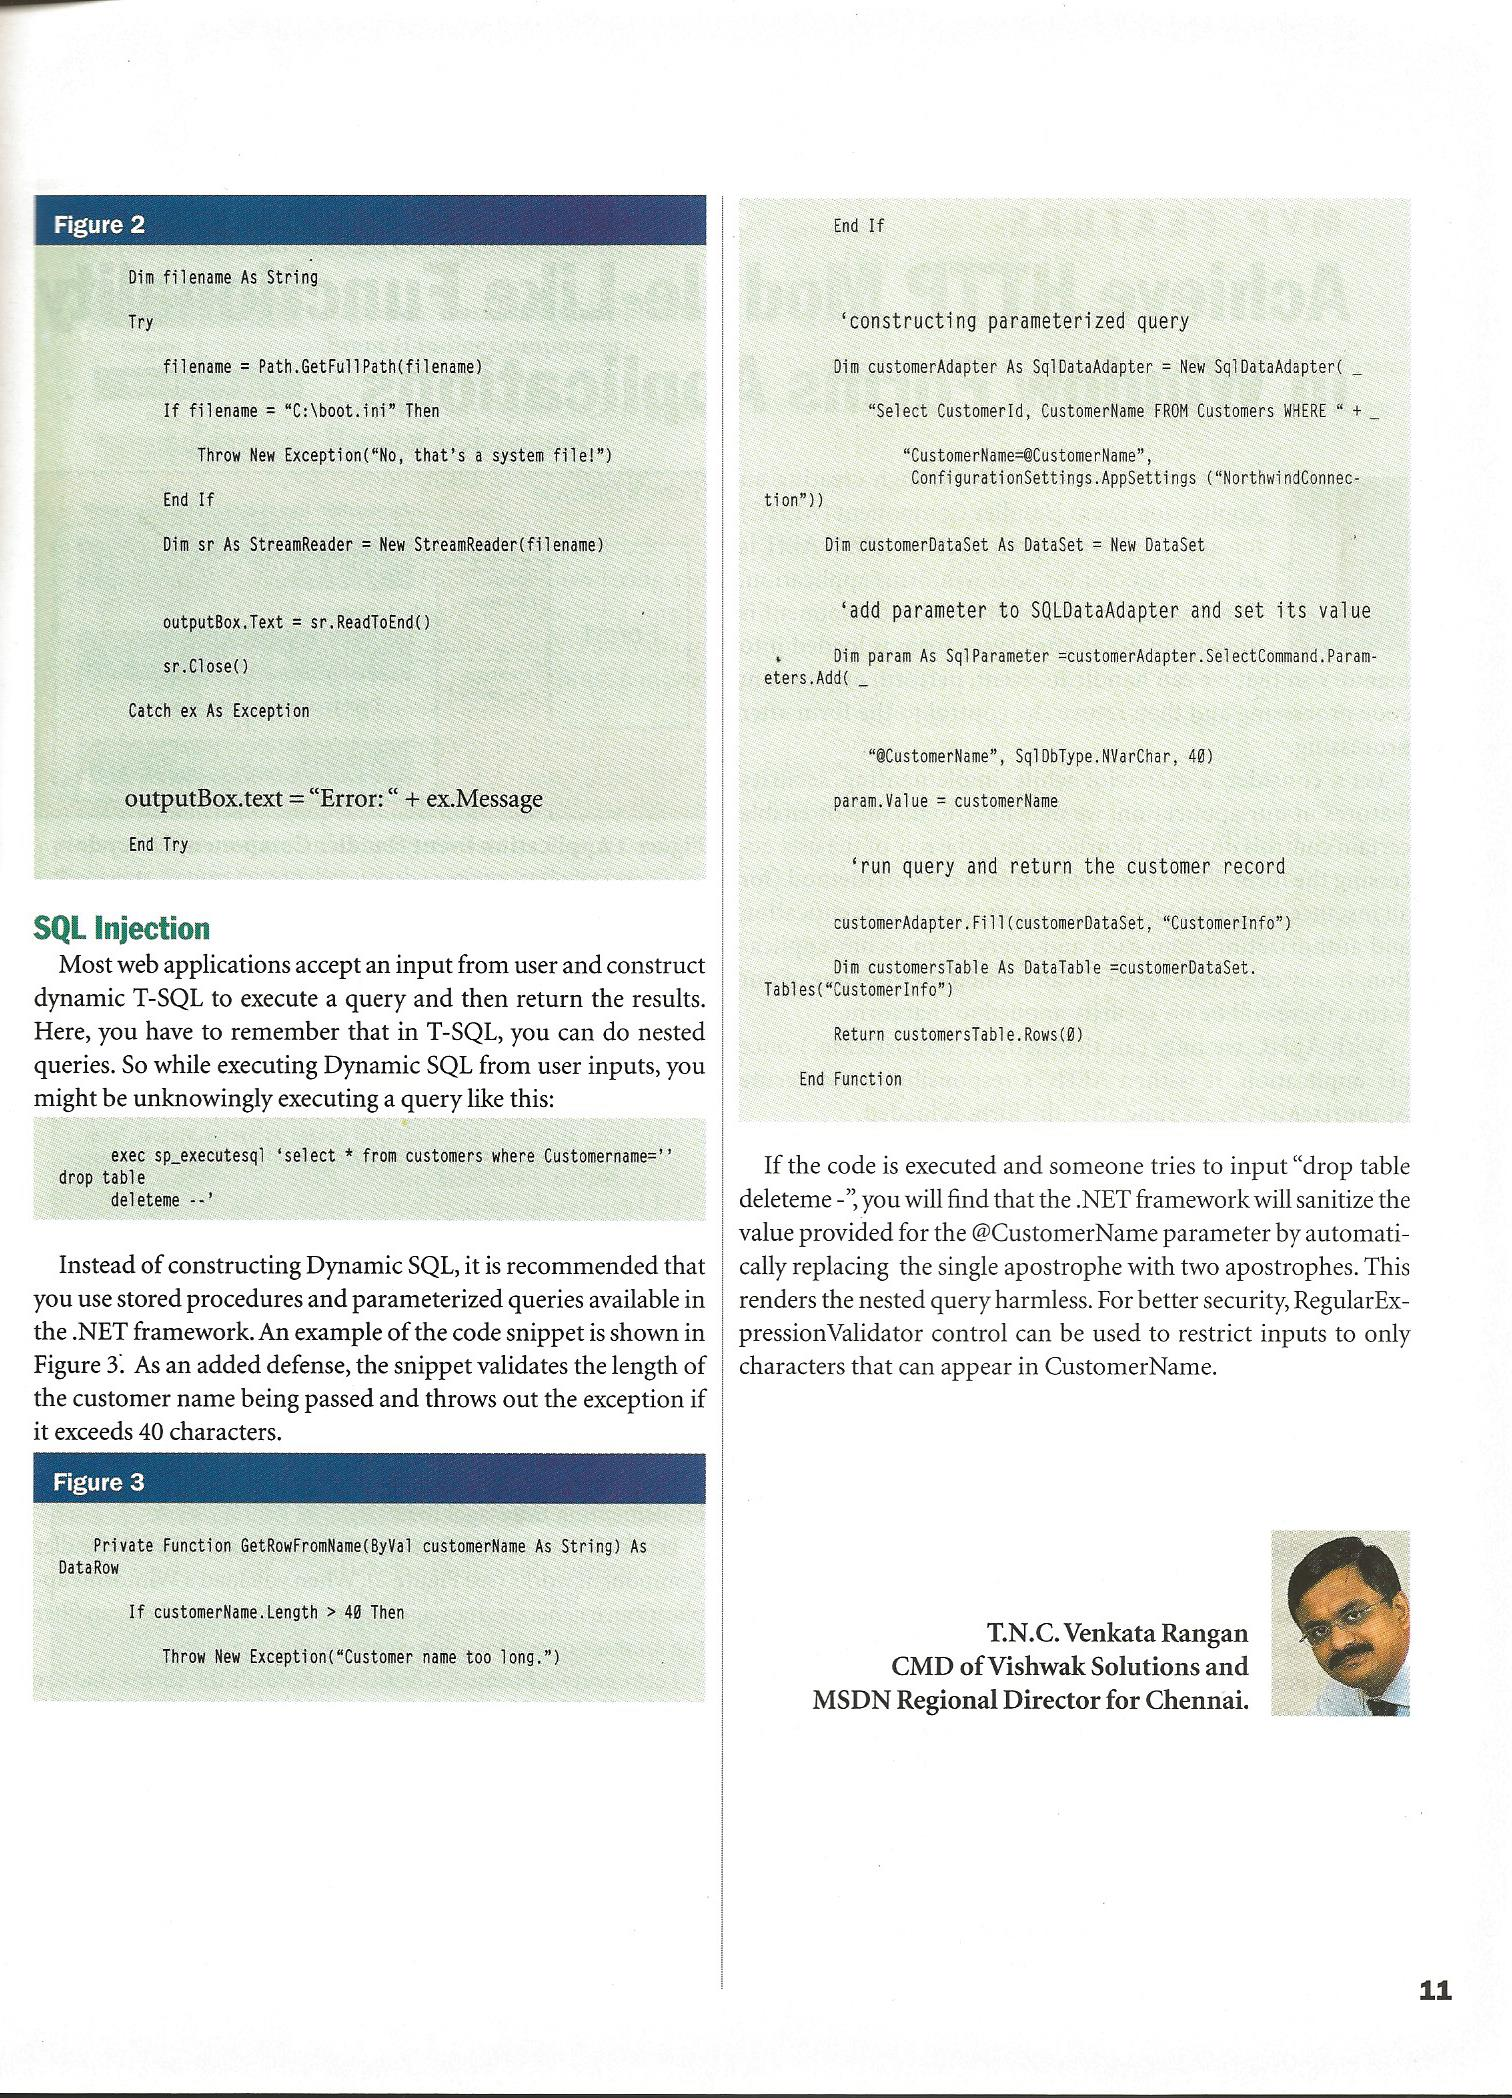 msdnindia-magazine-10002